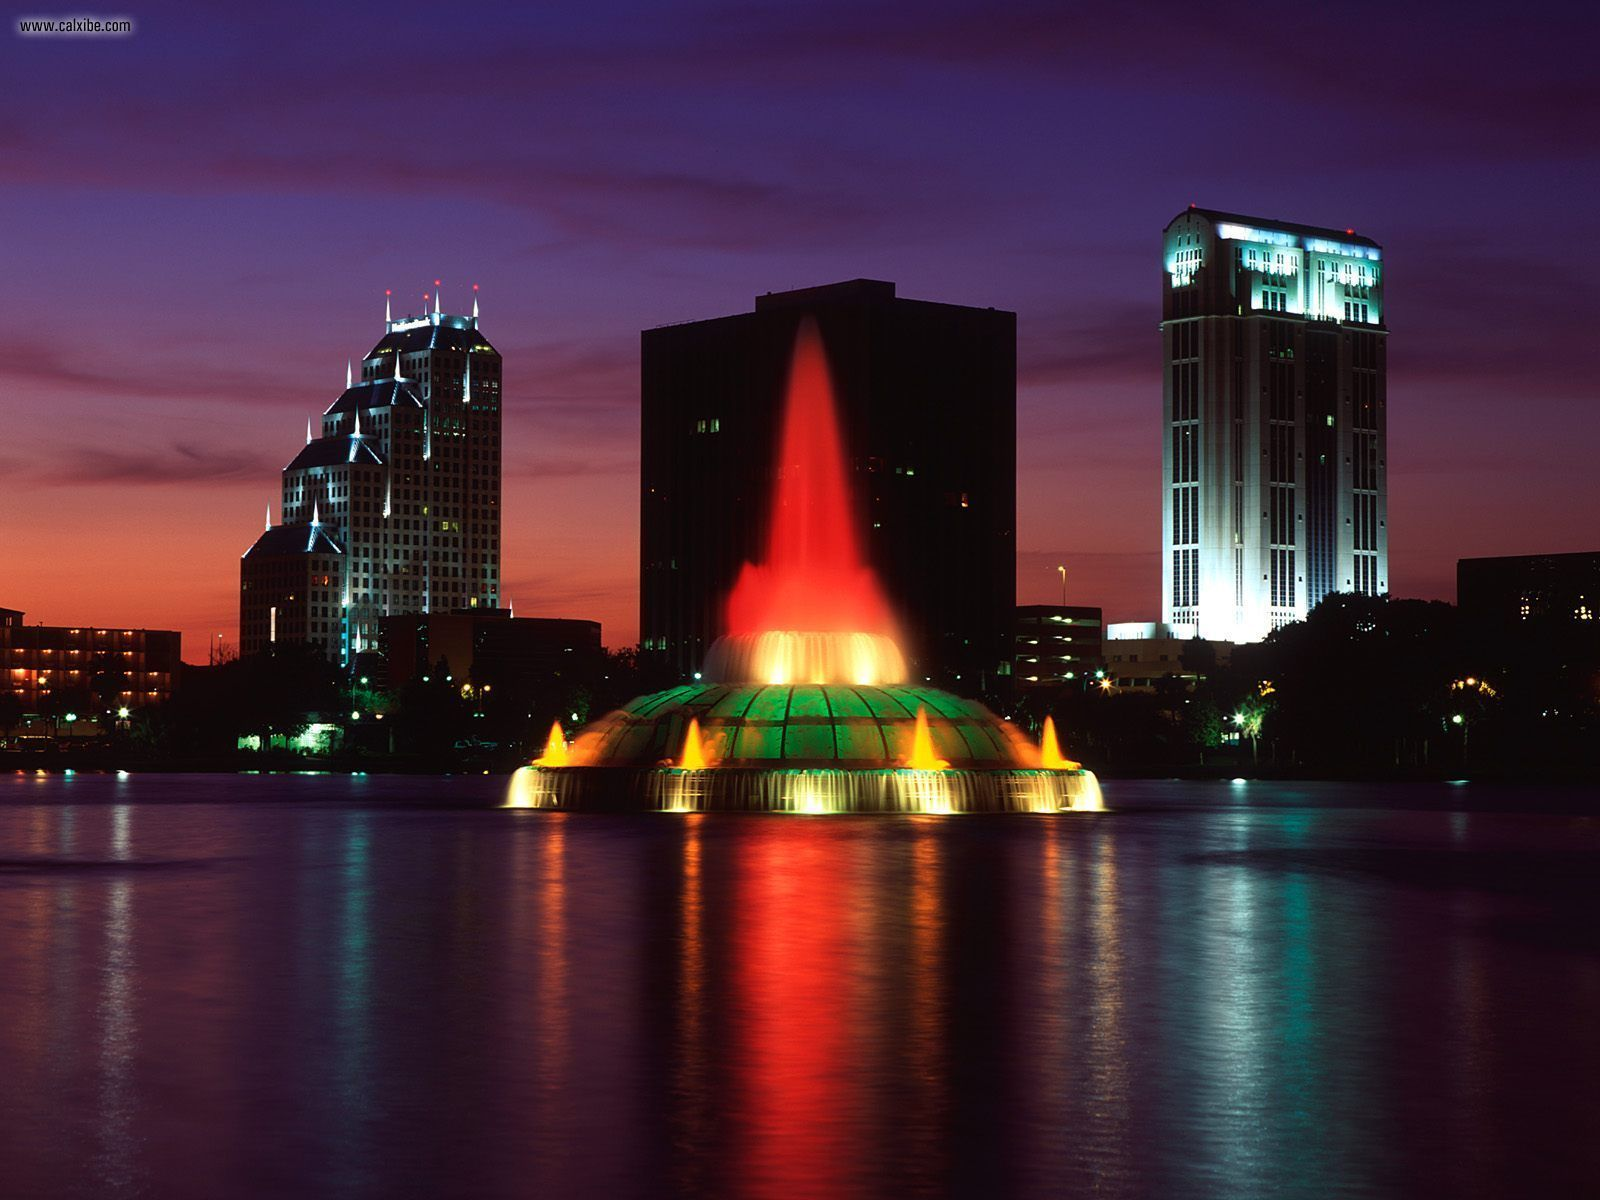 Buildings City Lake Eola Orlando Florida picture nr 22726 1600x1200